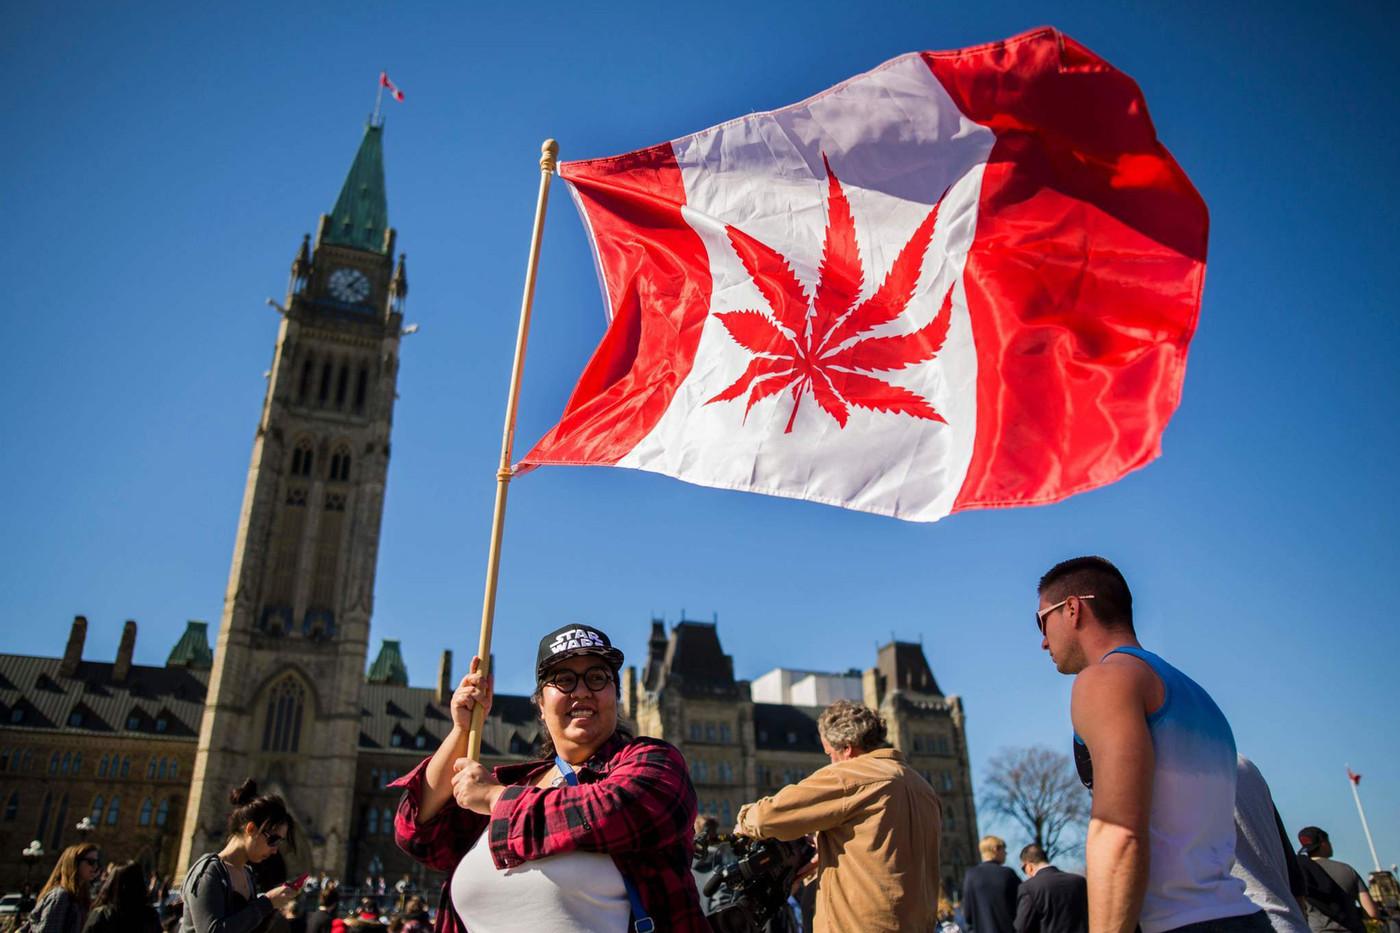 https_%2F%2Fhypebeast.com%2Fimage%2F2018%2F06%2Fcanada-legalizes-marijuana-recreational-1.jpg